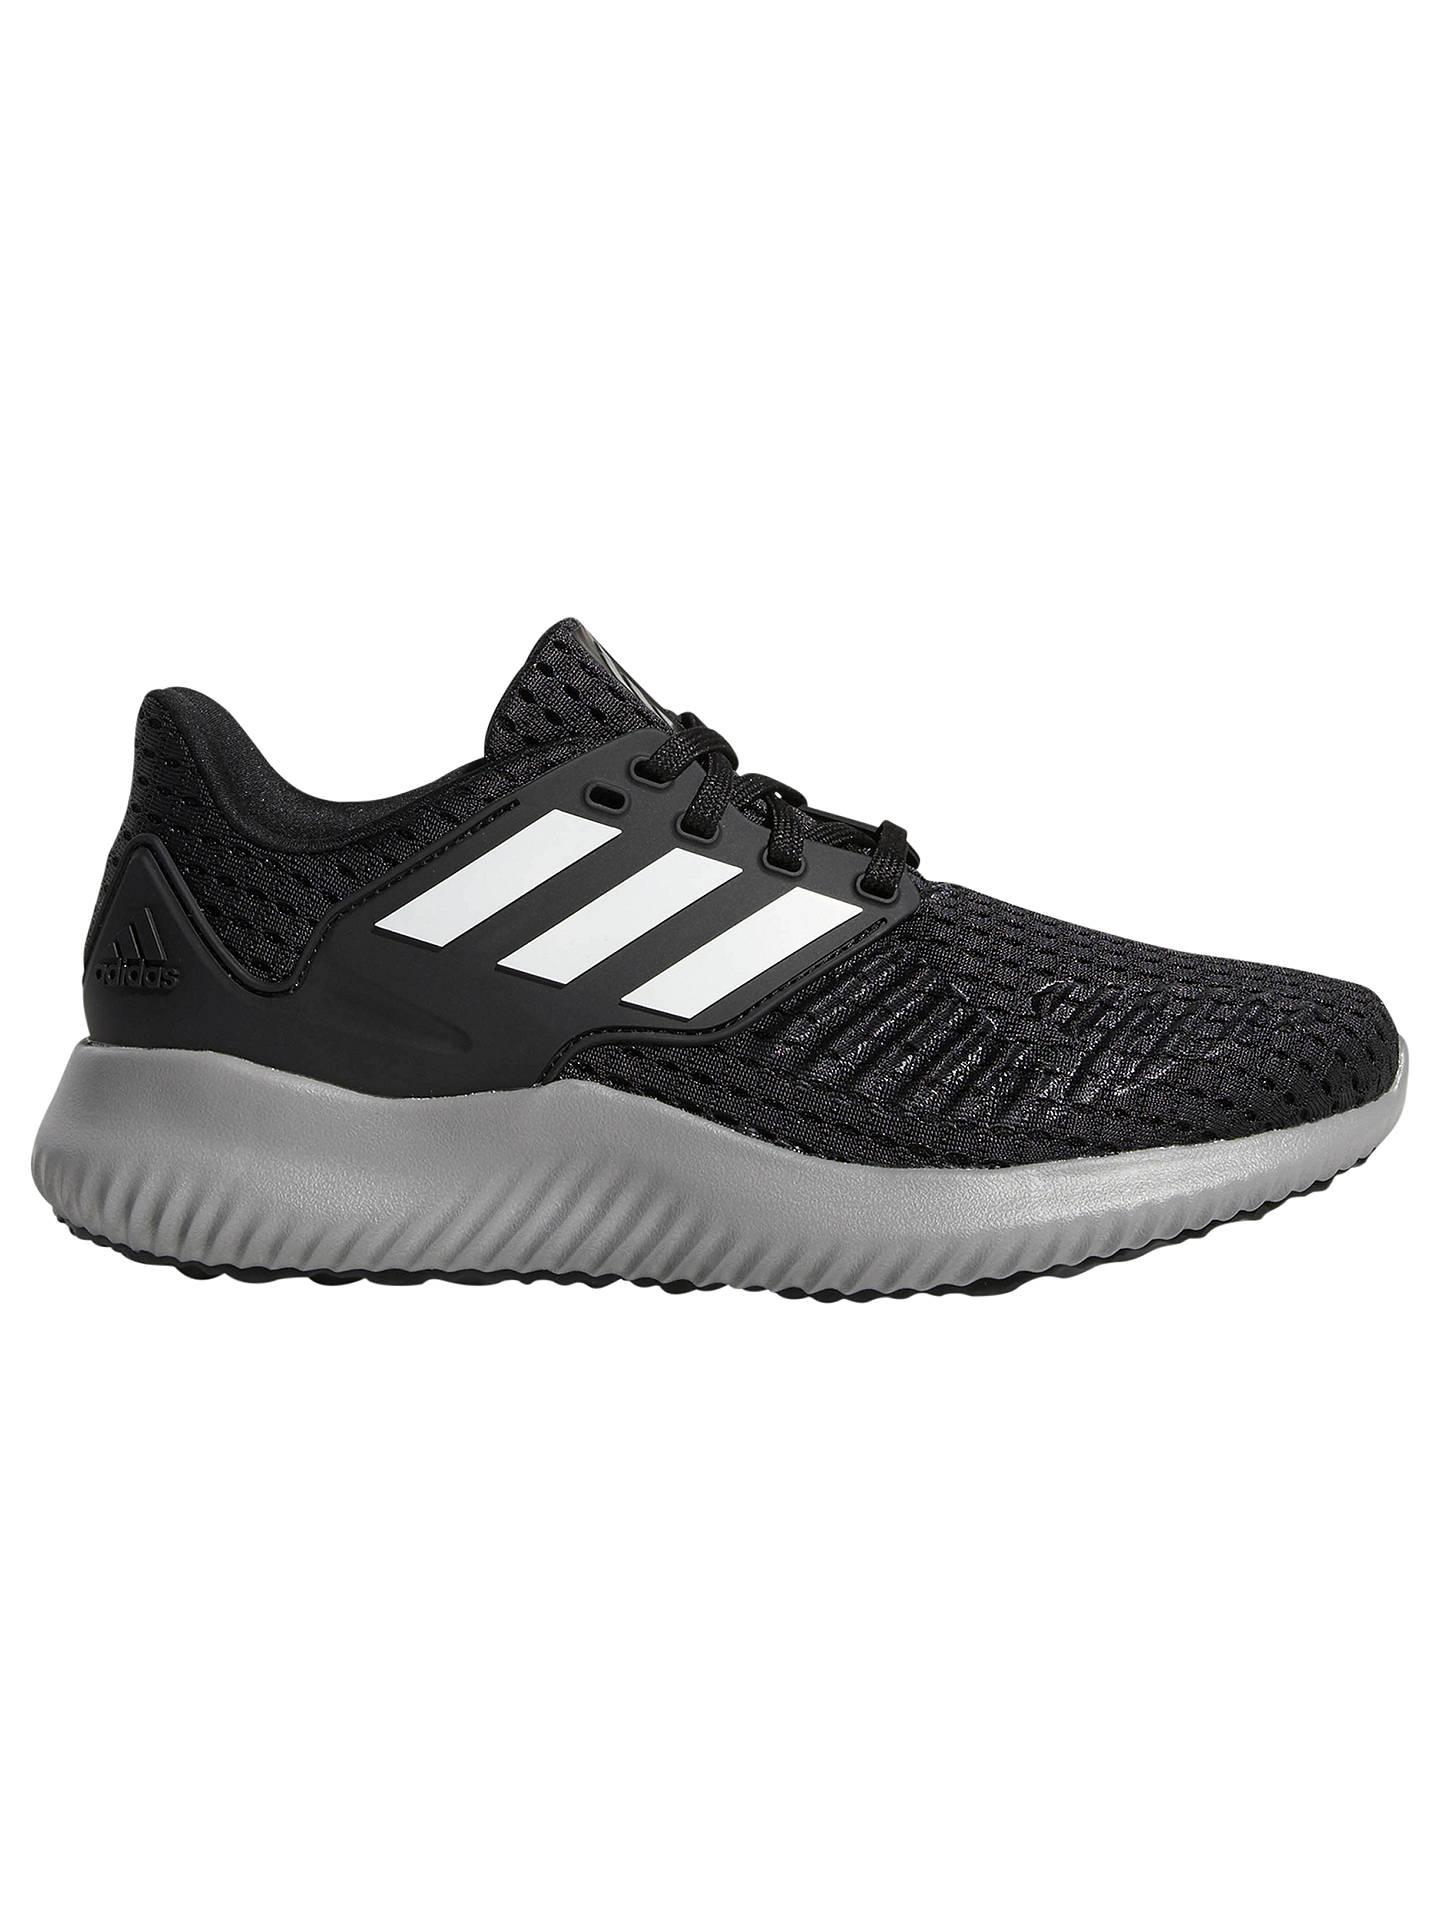 427a482d29d577 Buy adidas Alphabounce RC 2.0 Women s Running Shoes